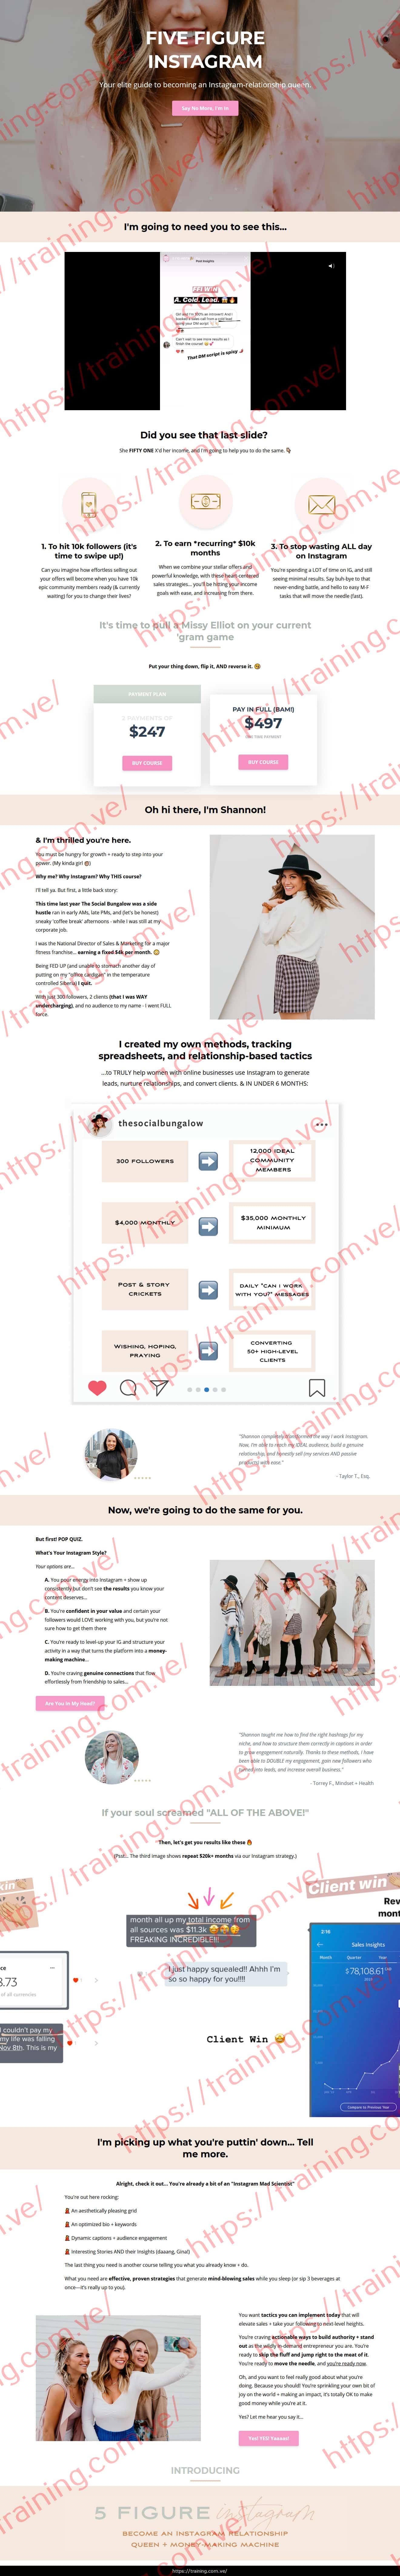 Five Figure Instagram by Shannon Lutz Sales Page